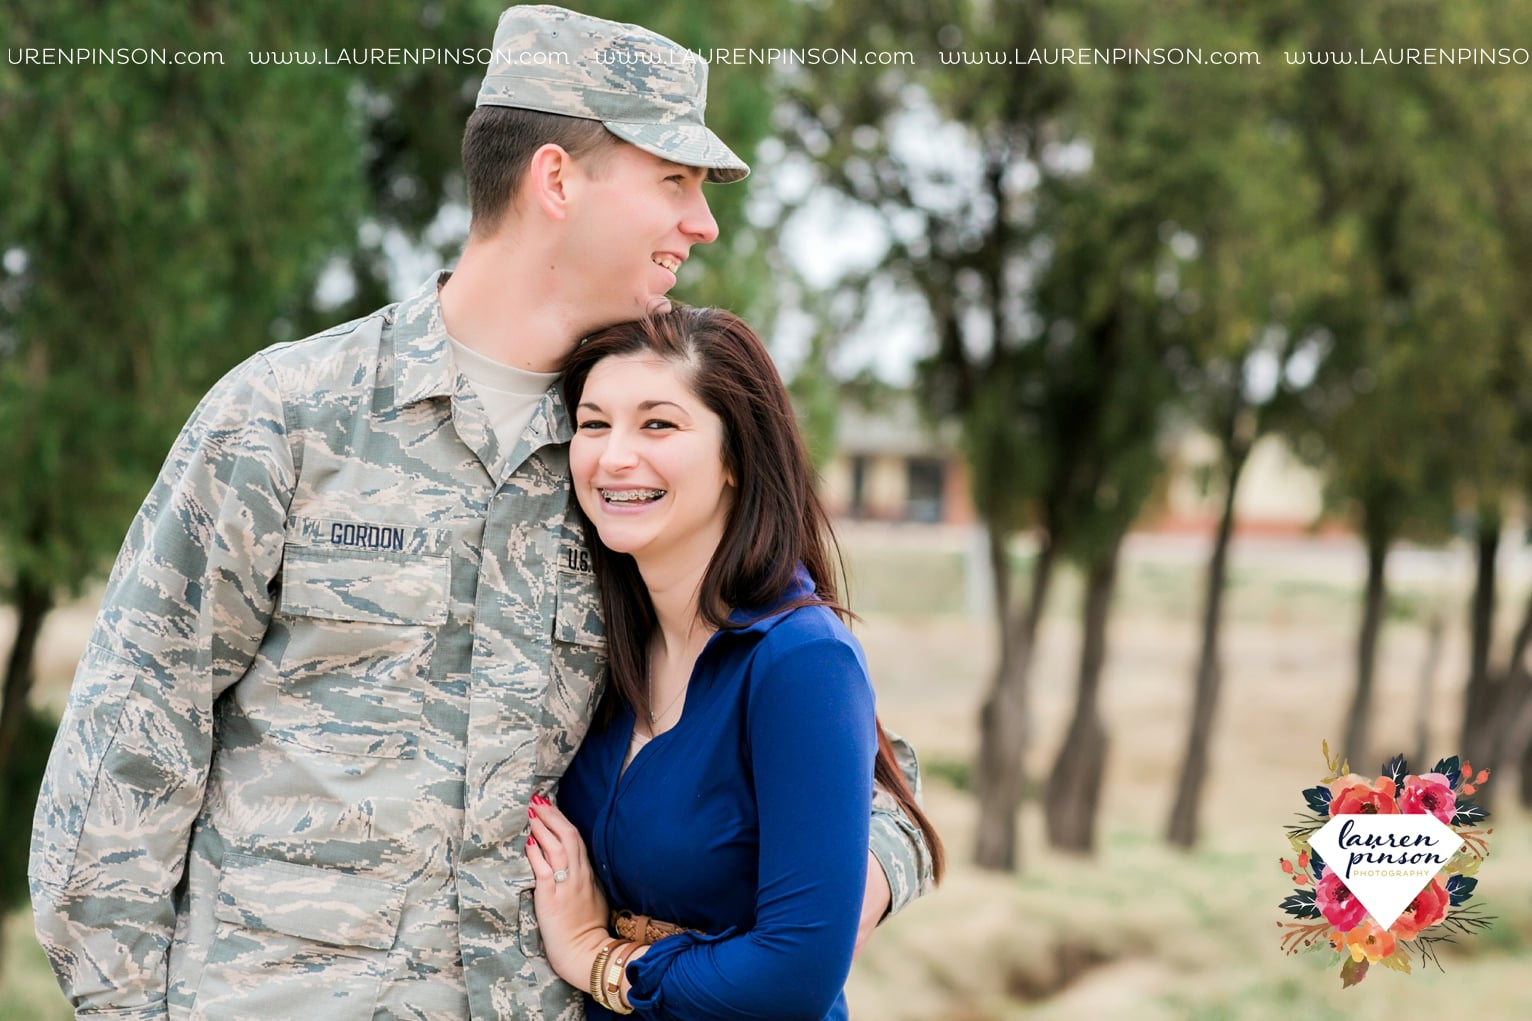 sheppard-afb-wichita-falls-engagement-session-airmen-in-uniform-abu-airplanes-bride-engagement-ring-texas-air-force-base_1994.jpg